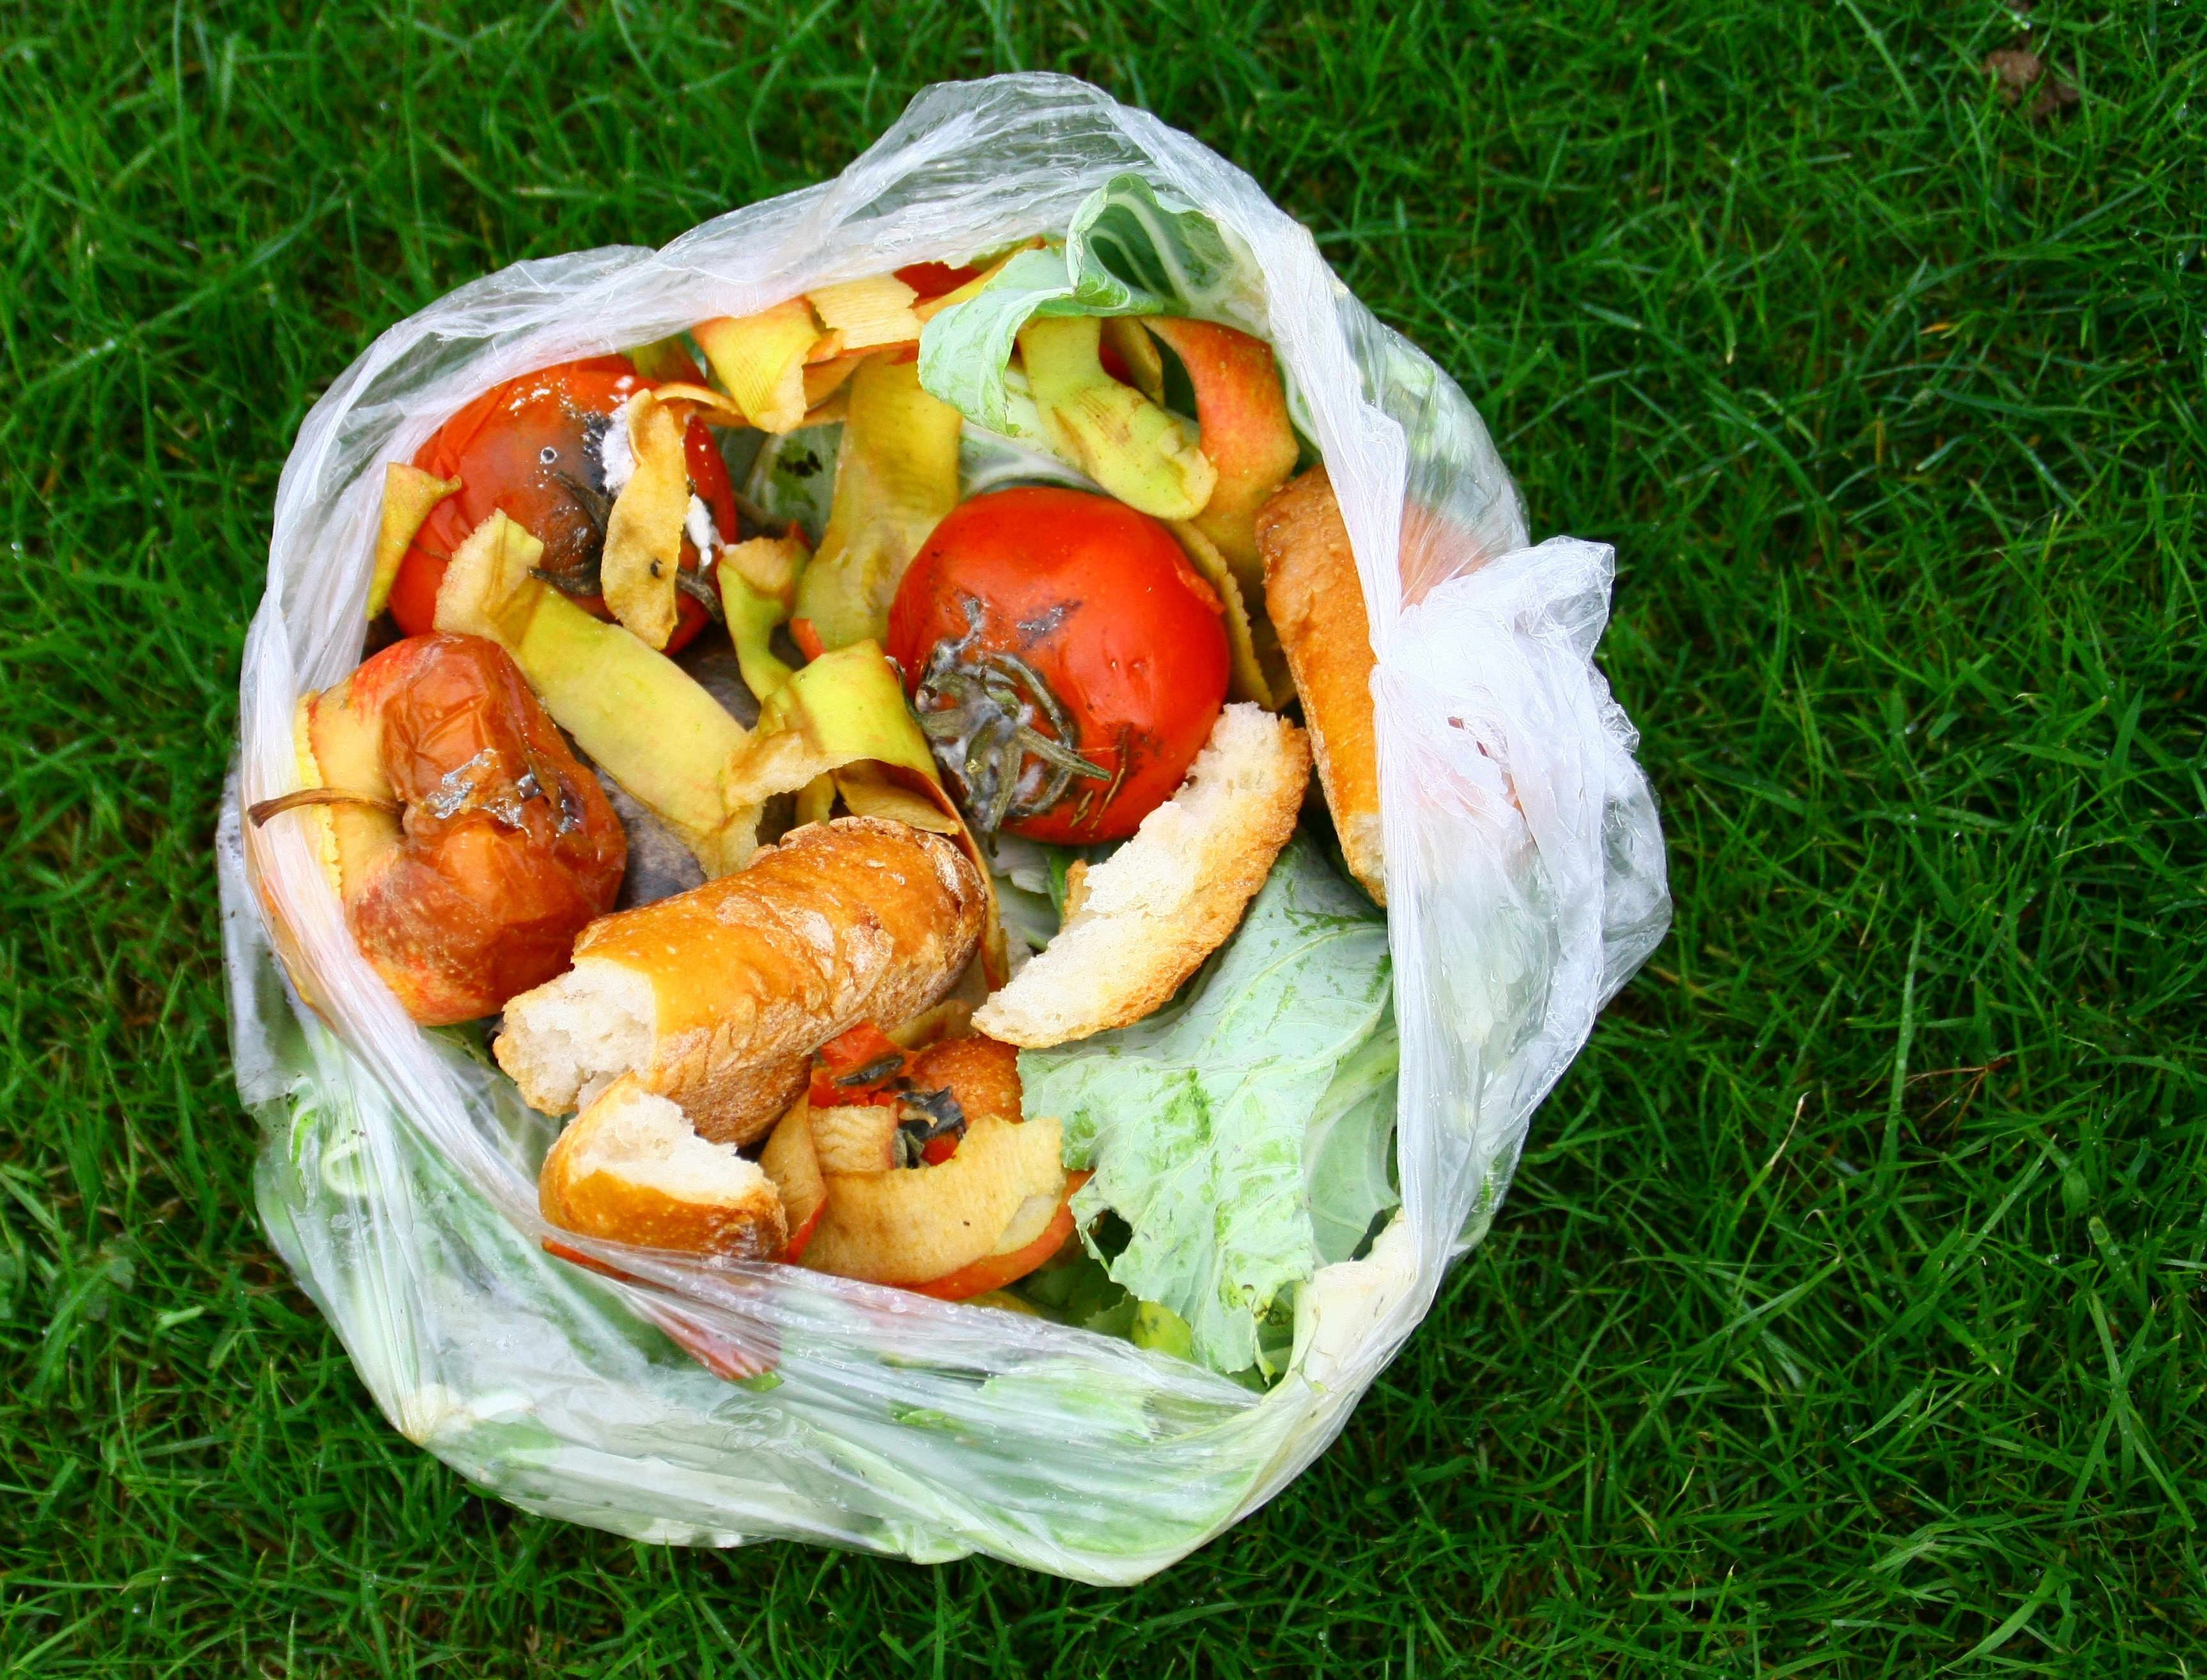 sac de dchets alimentaires pour compost © Patryssia / Adobe Stock